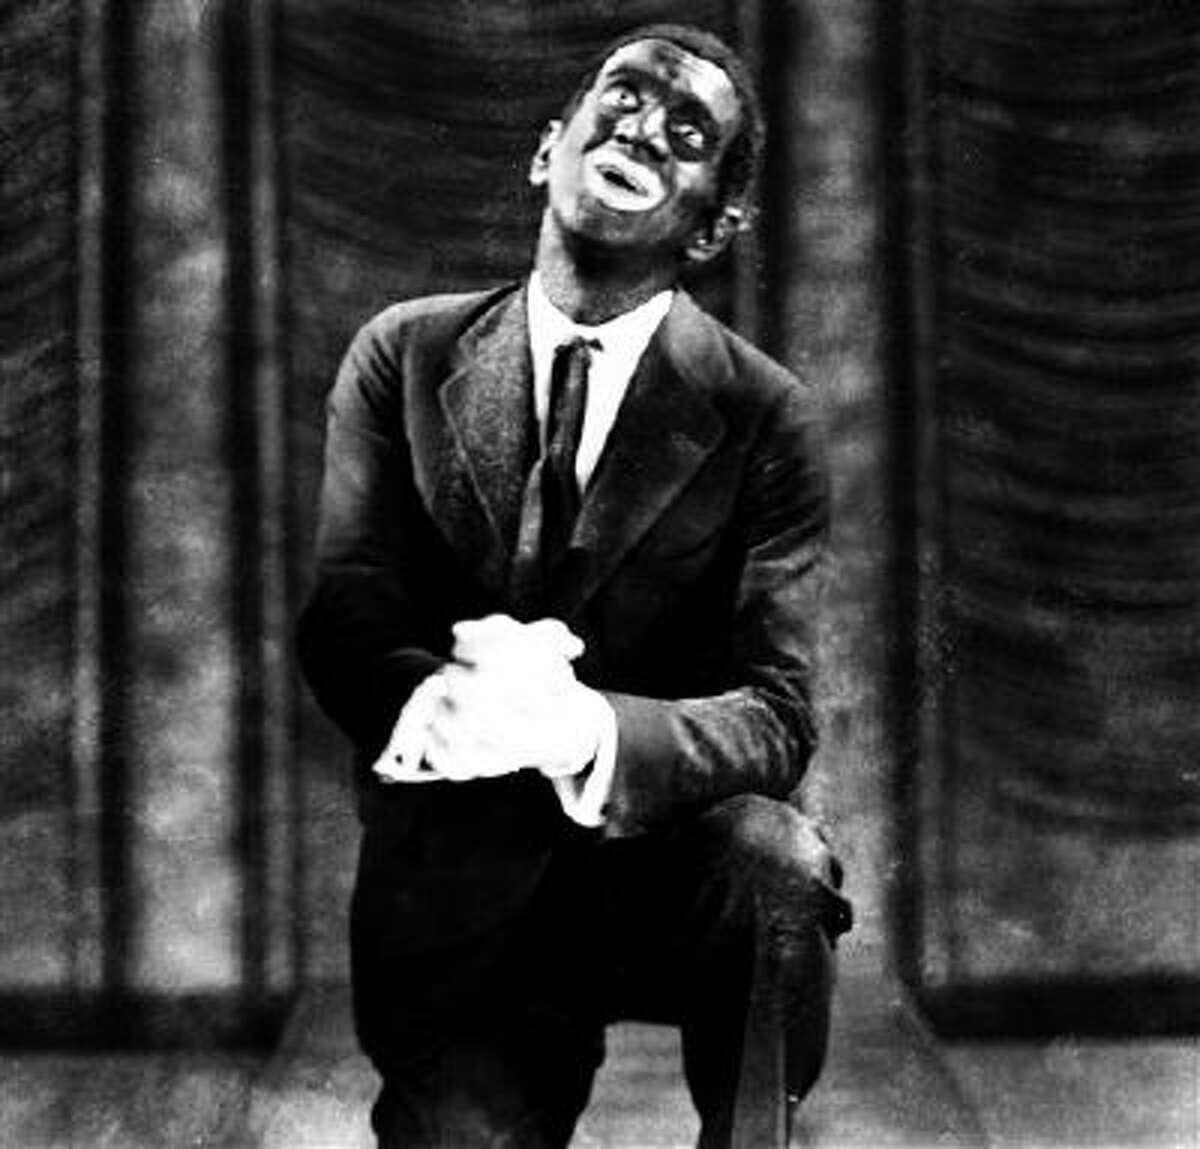 This 1927 image originally released by Warner Bros., shows Al Jolson in blackface makeup in the movie